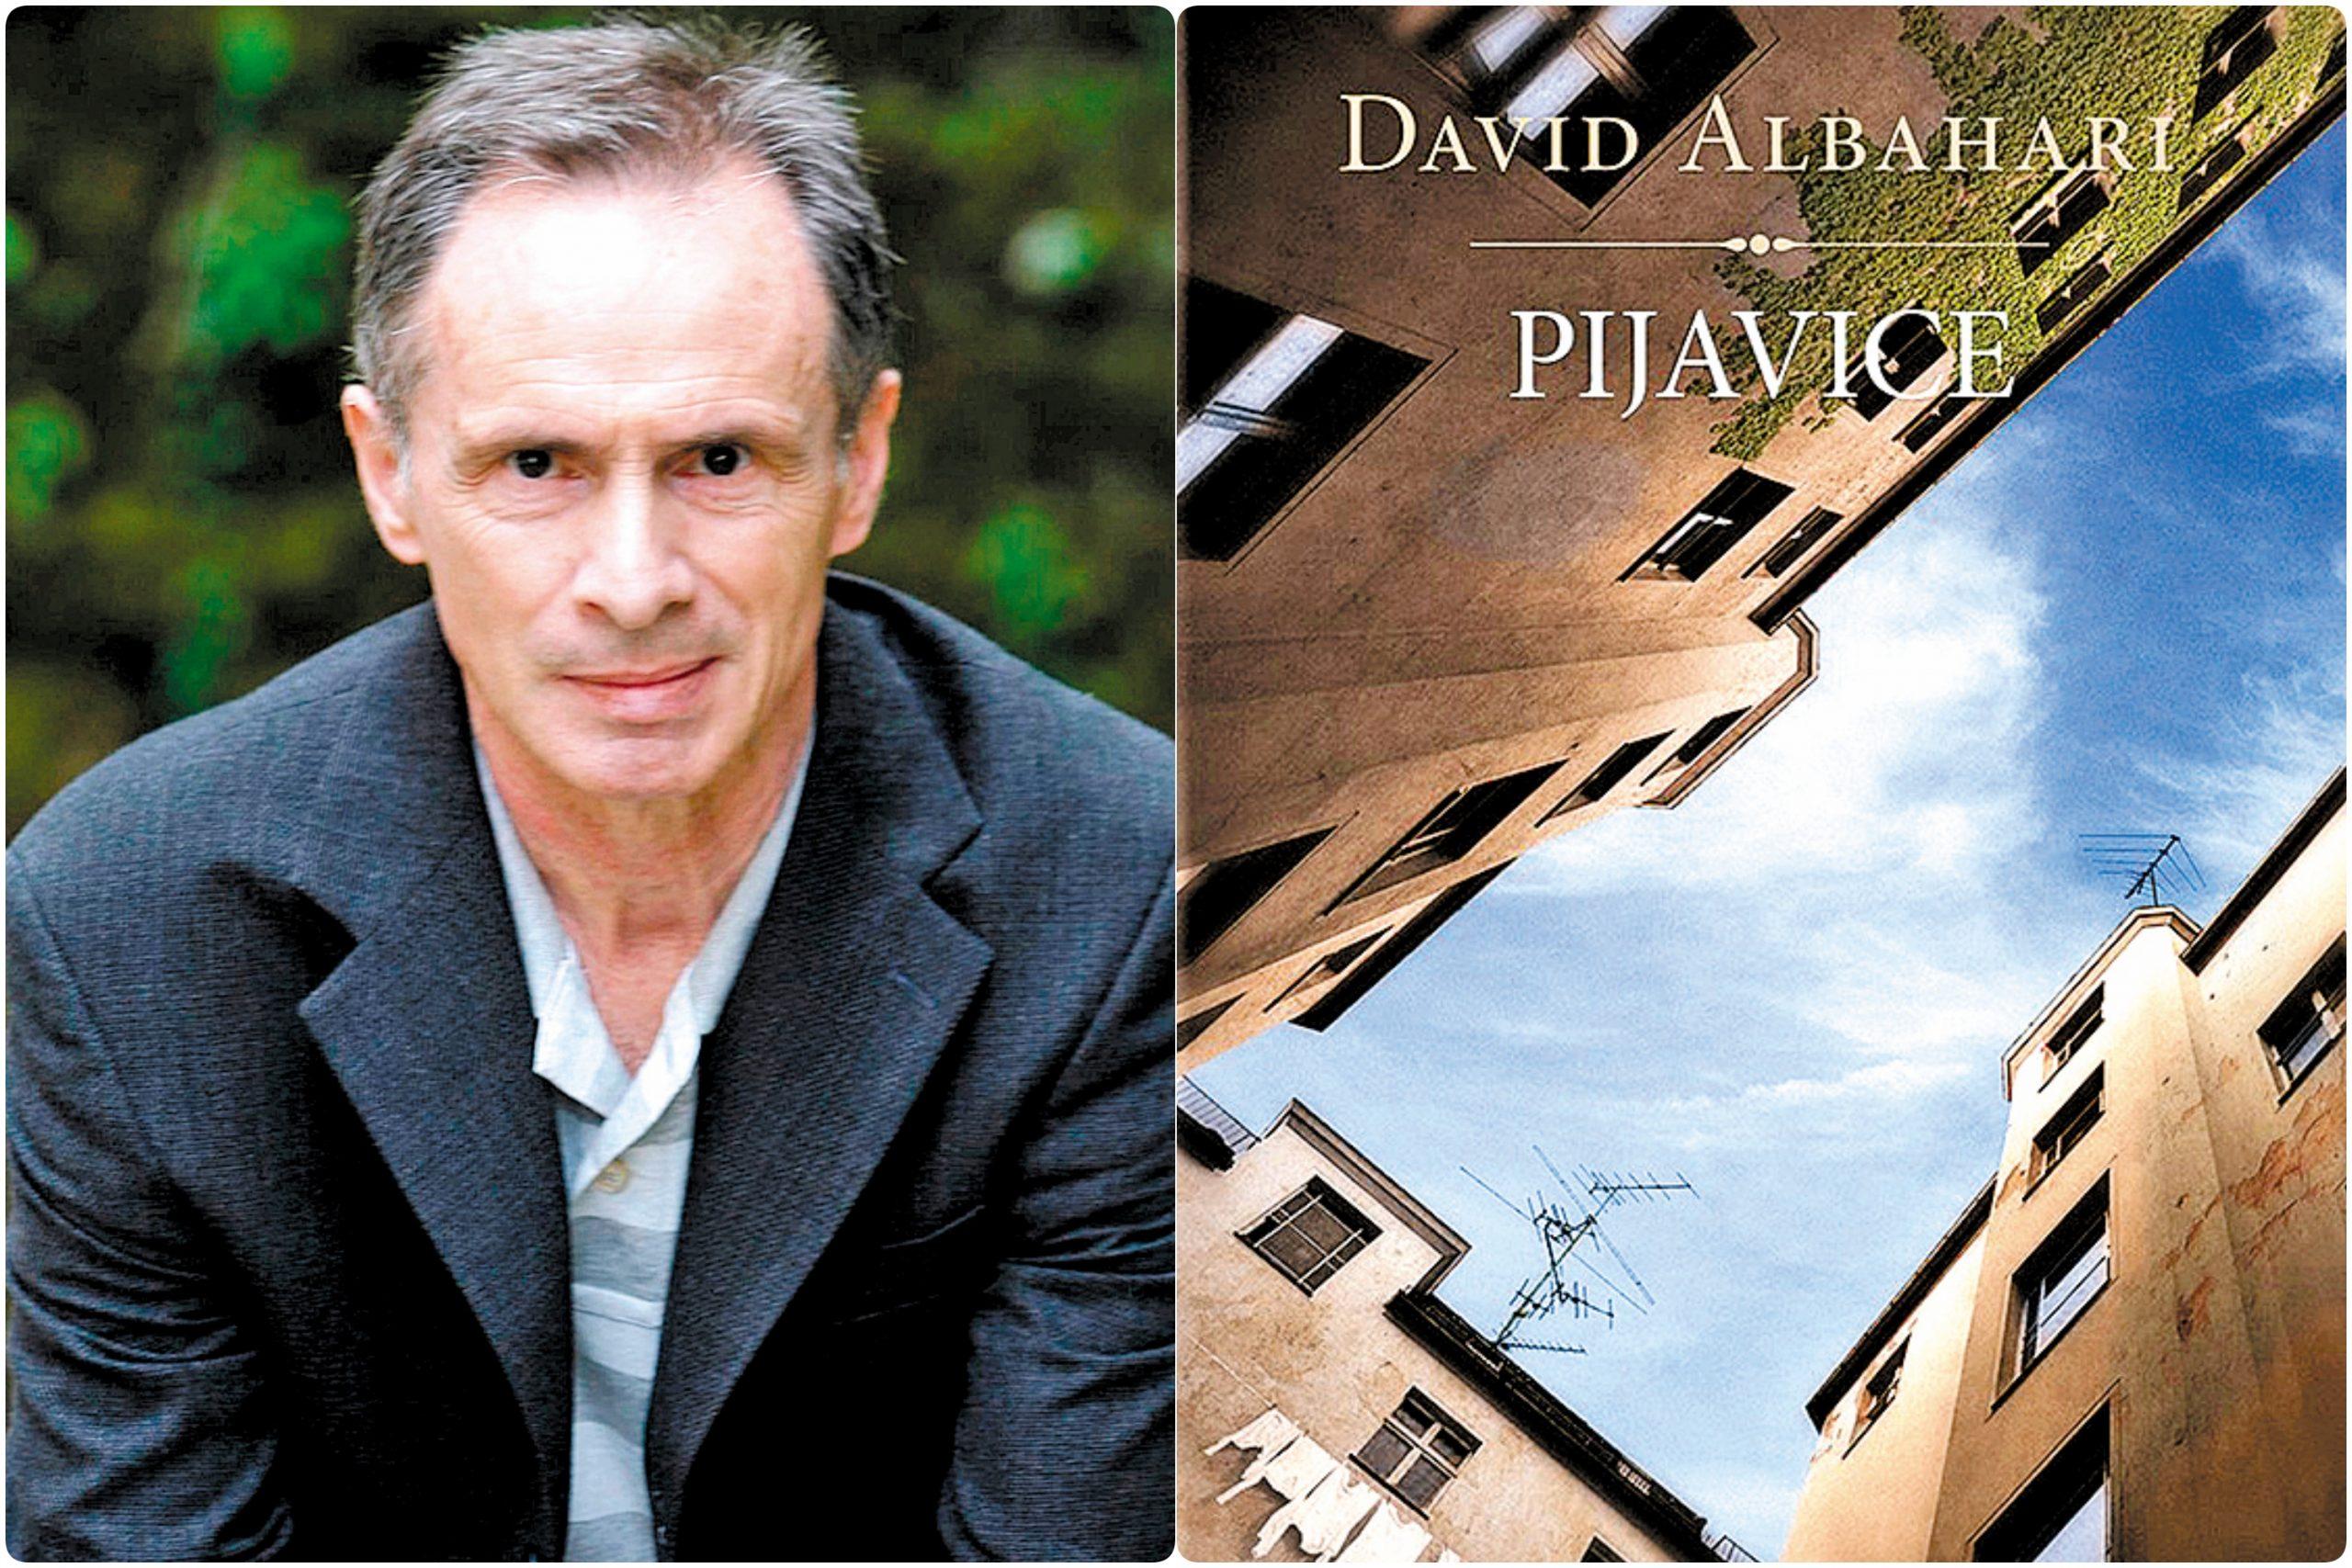 David Albahari